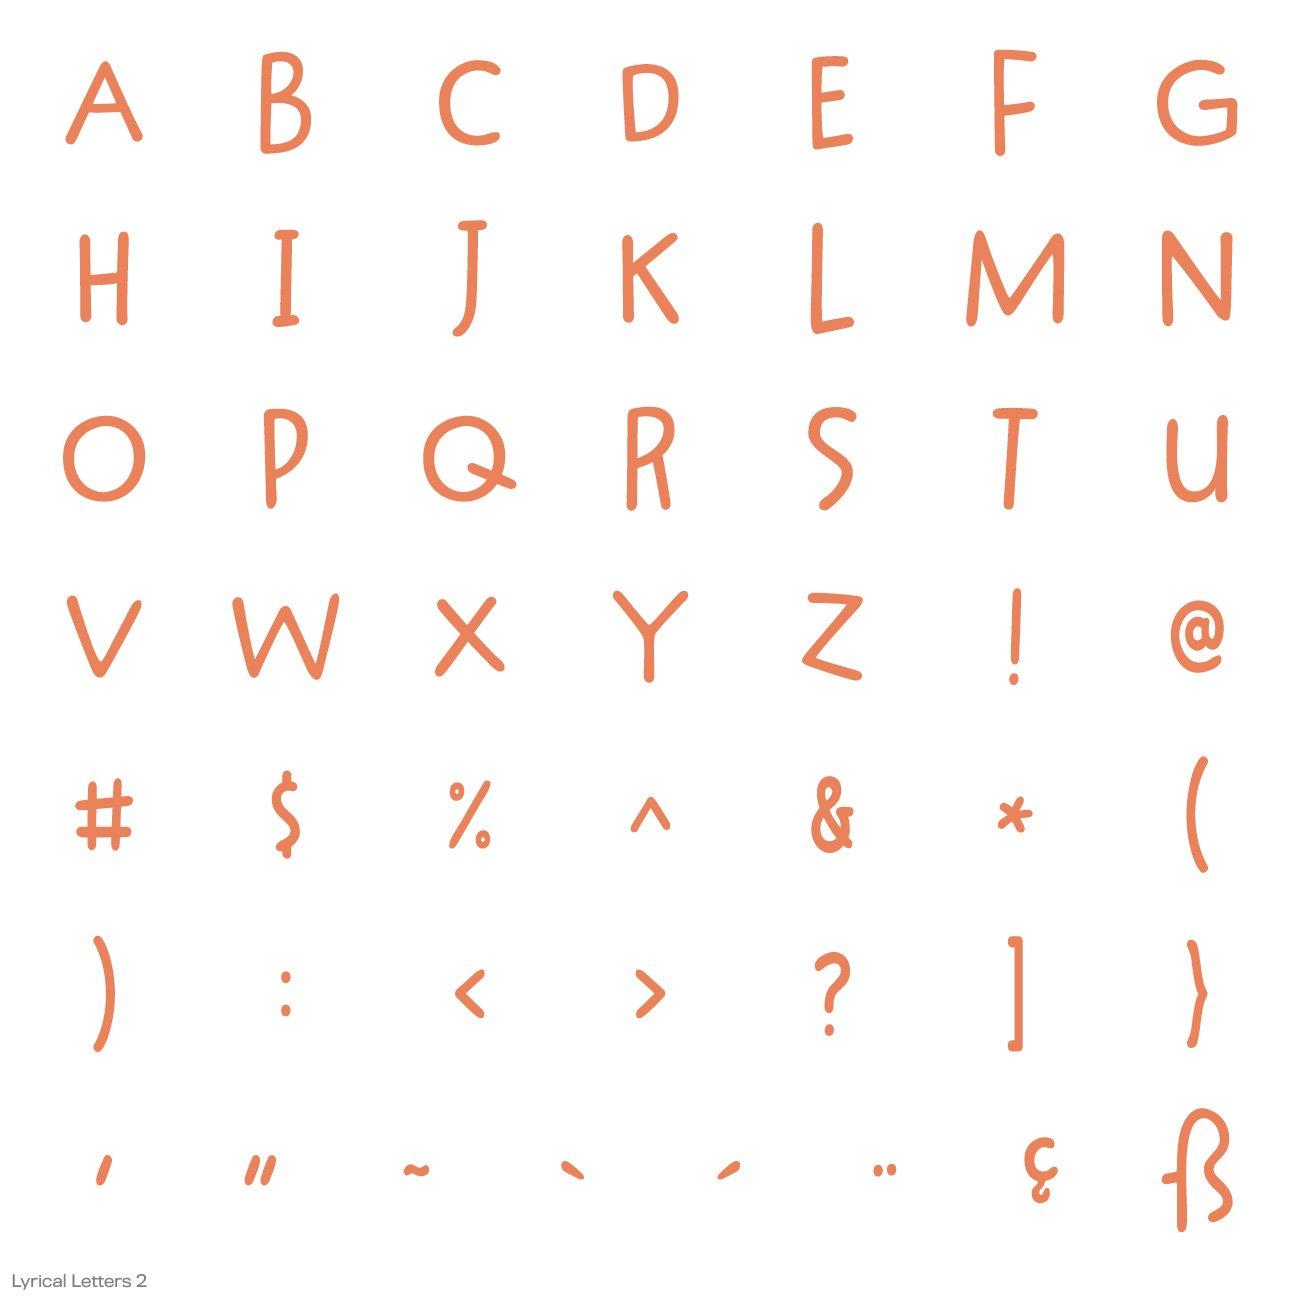 Cricut Lyrical Letters 2 Cartridge by Cricut (Image #13)